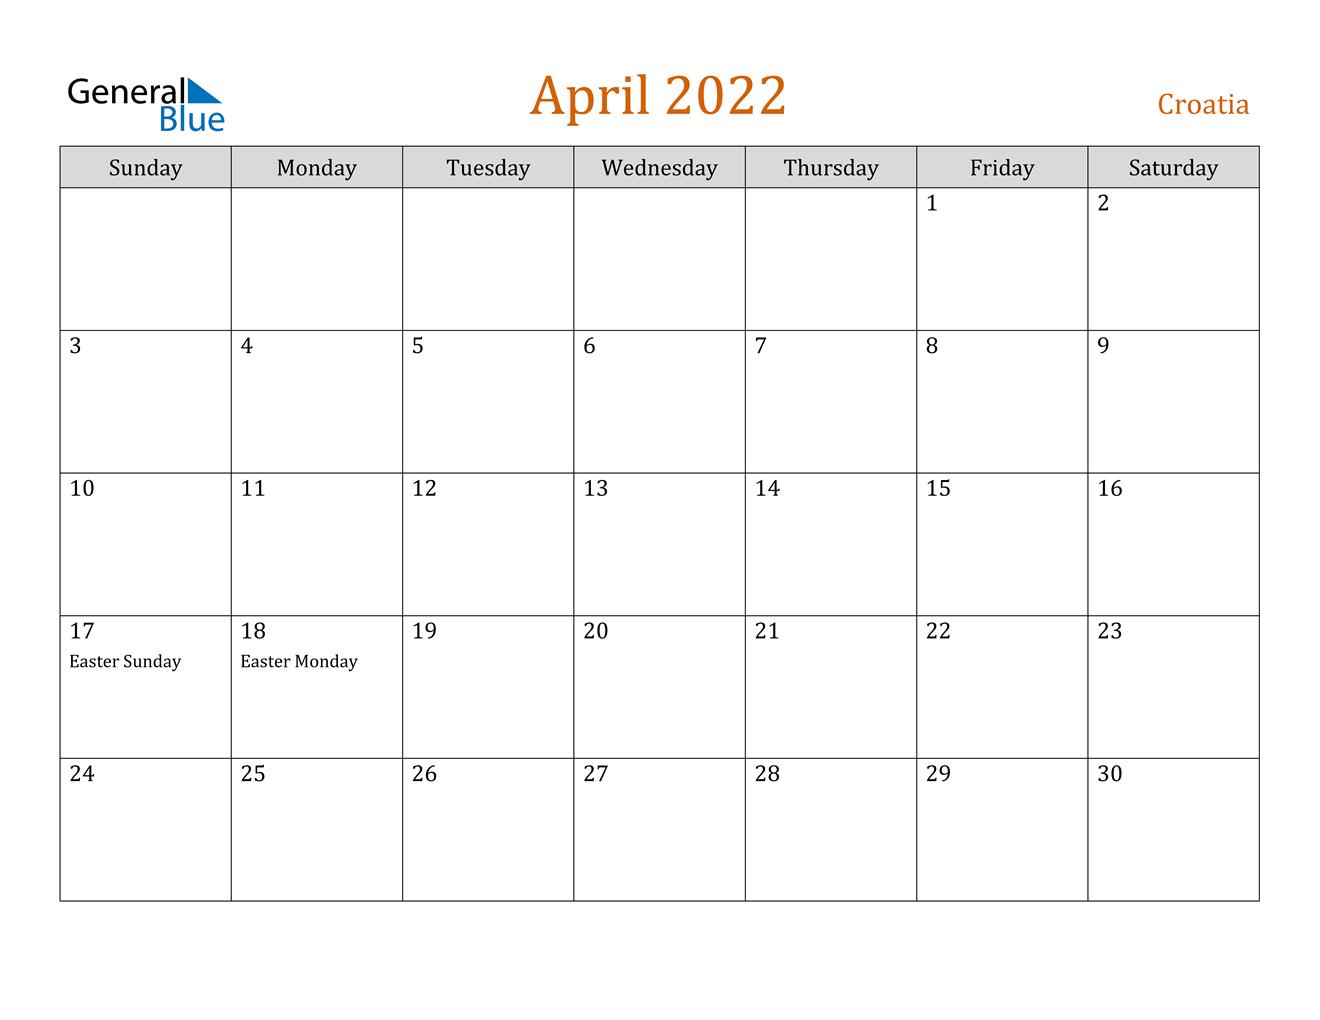 April 2022 Calendar - Croatia pertaining to April May Calendar 2022 Printable